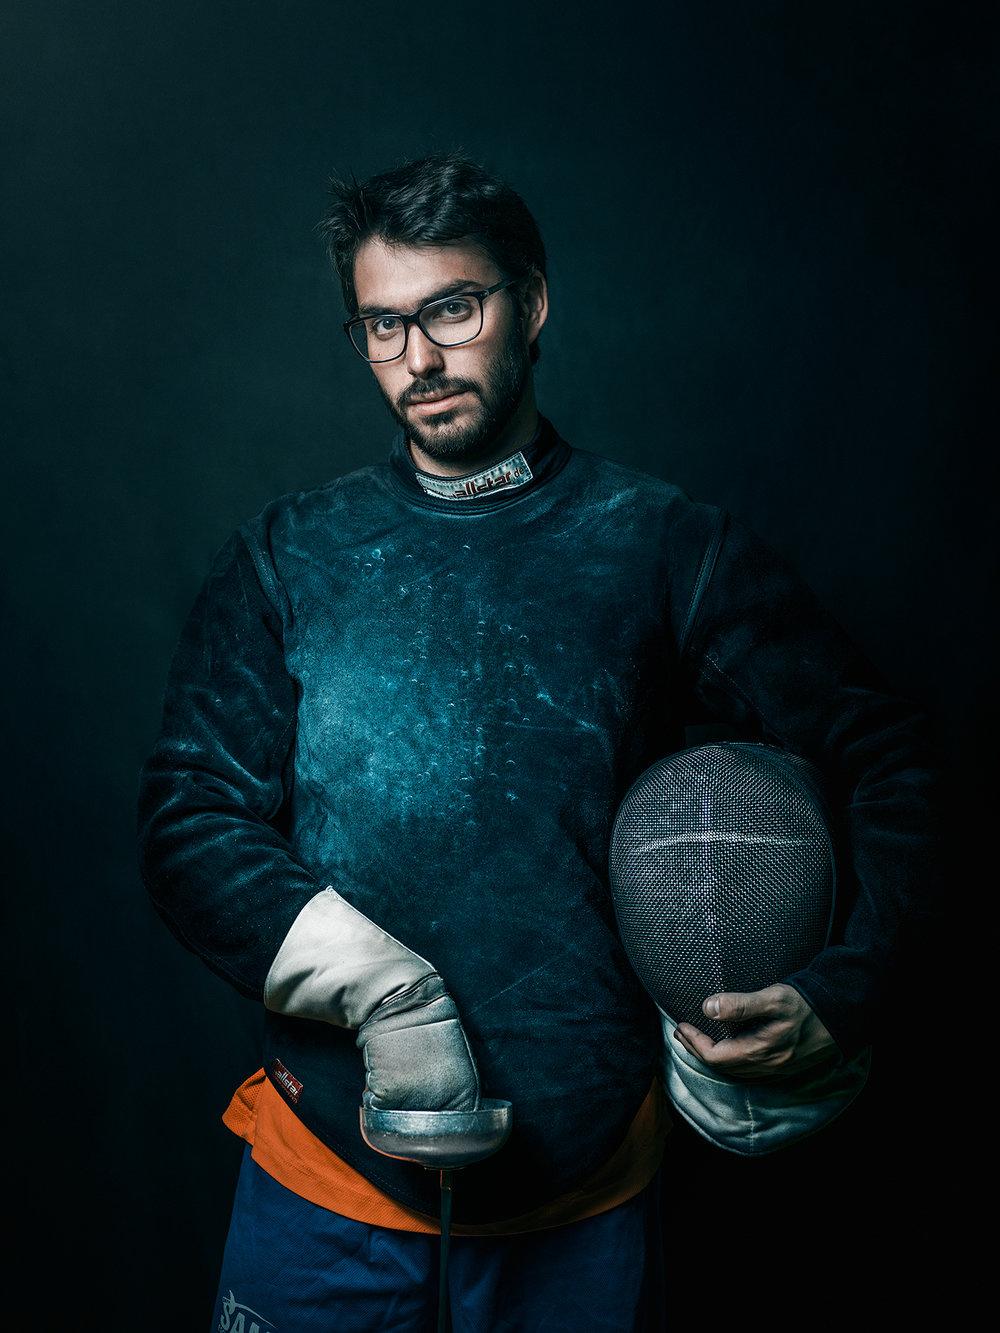 Oscar-arribas-esgrima-maestro-fencing-master-fencer-fechten-scherma-escrime-portrait-fotografo-retrato-photographer028.jpg